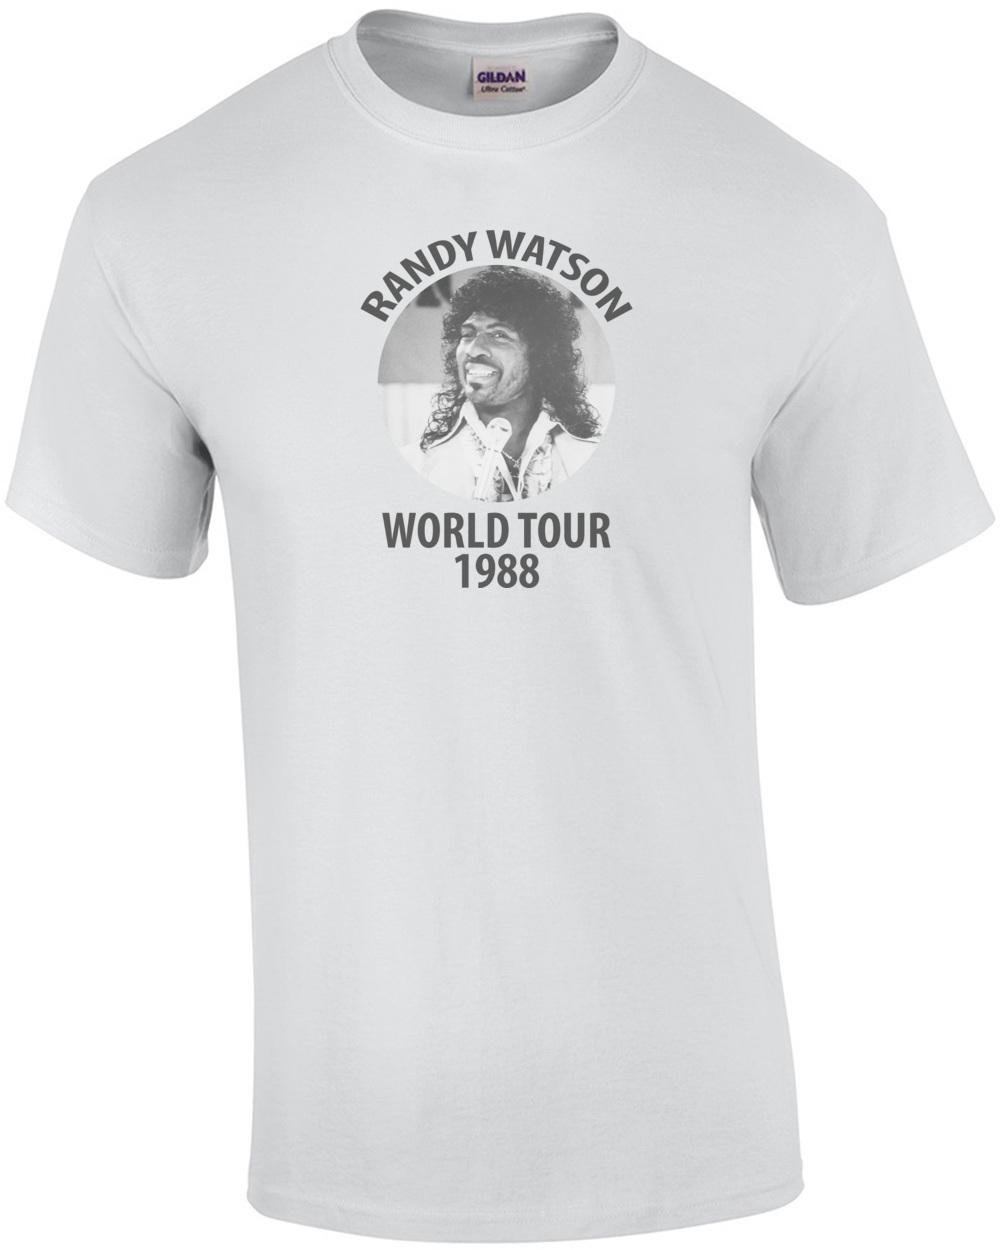 Randy watson t shirt our t shirt for No tuck golf shirts